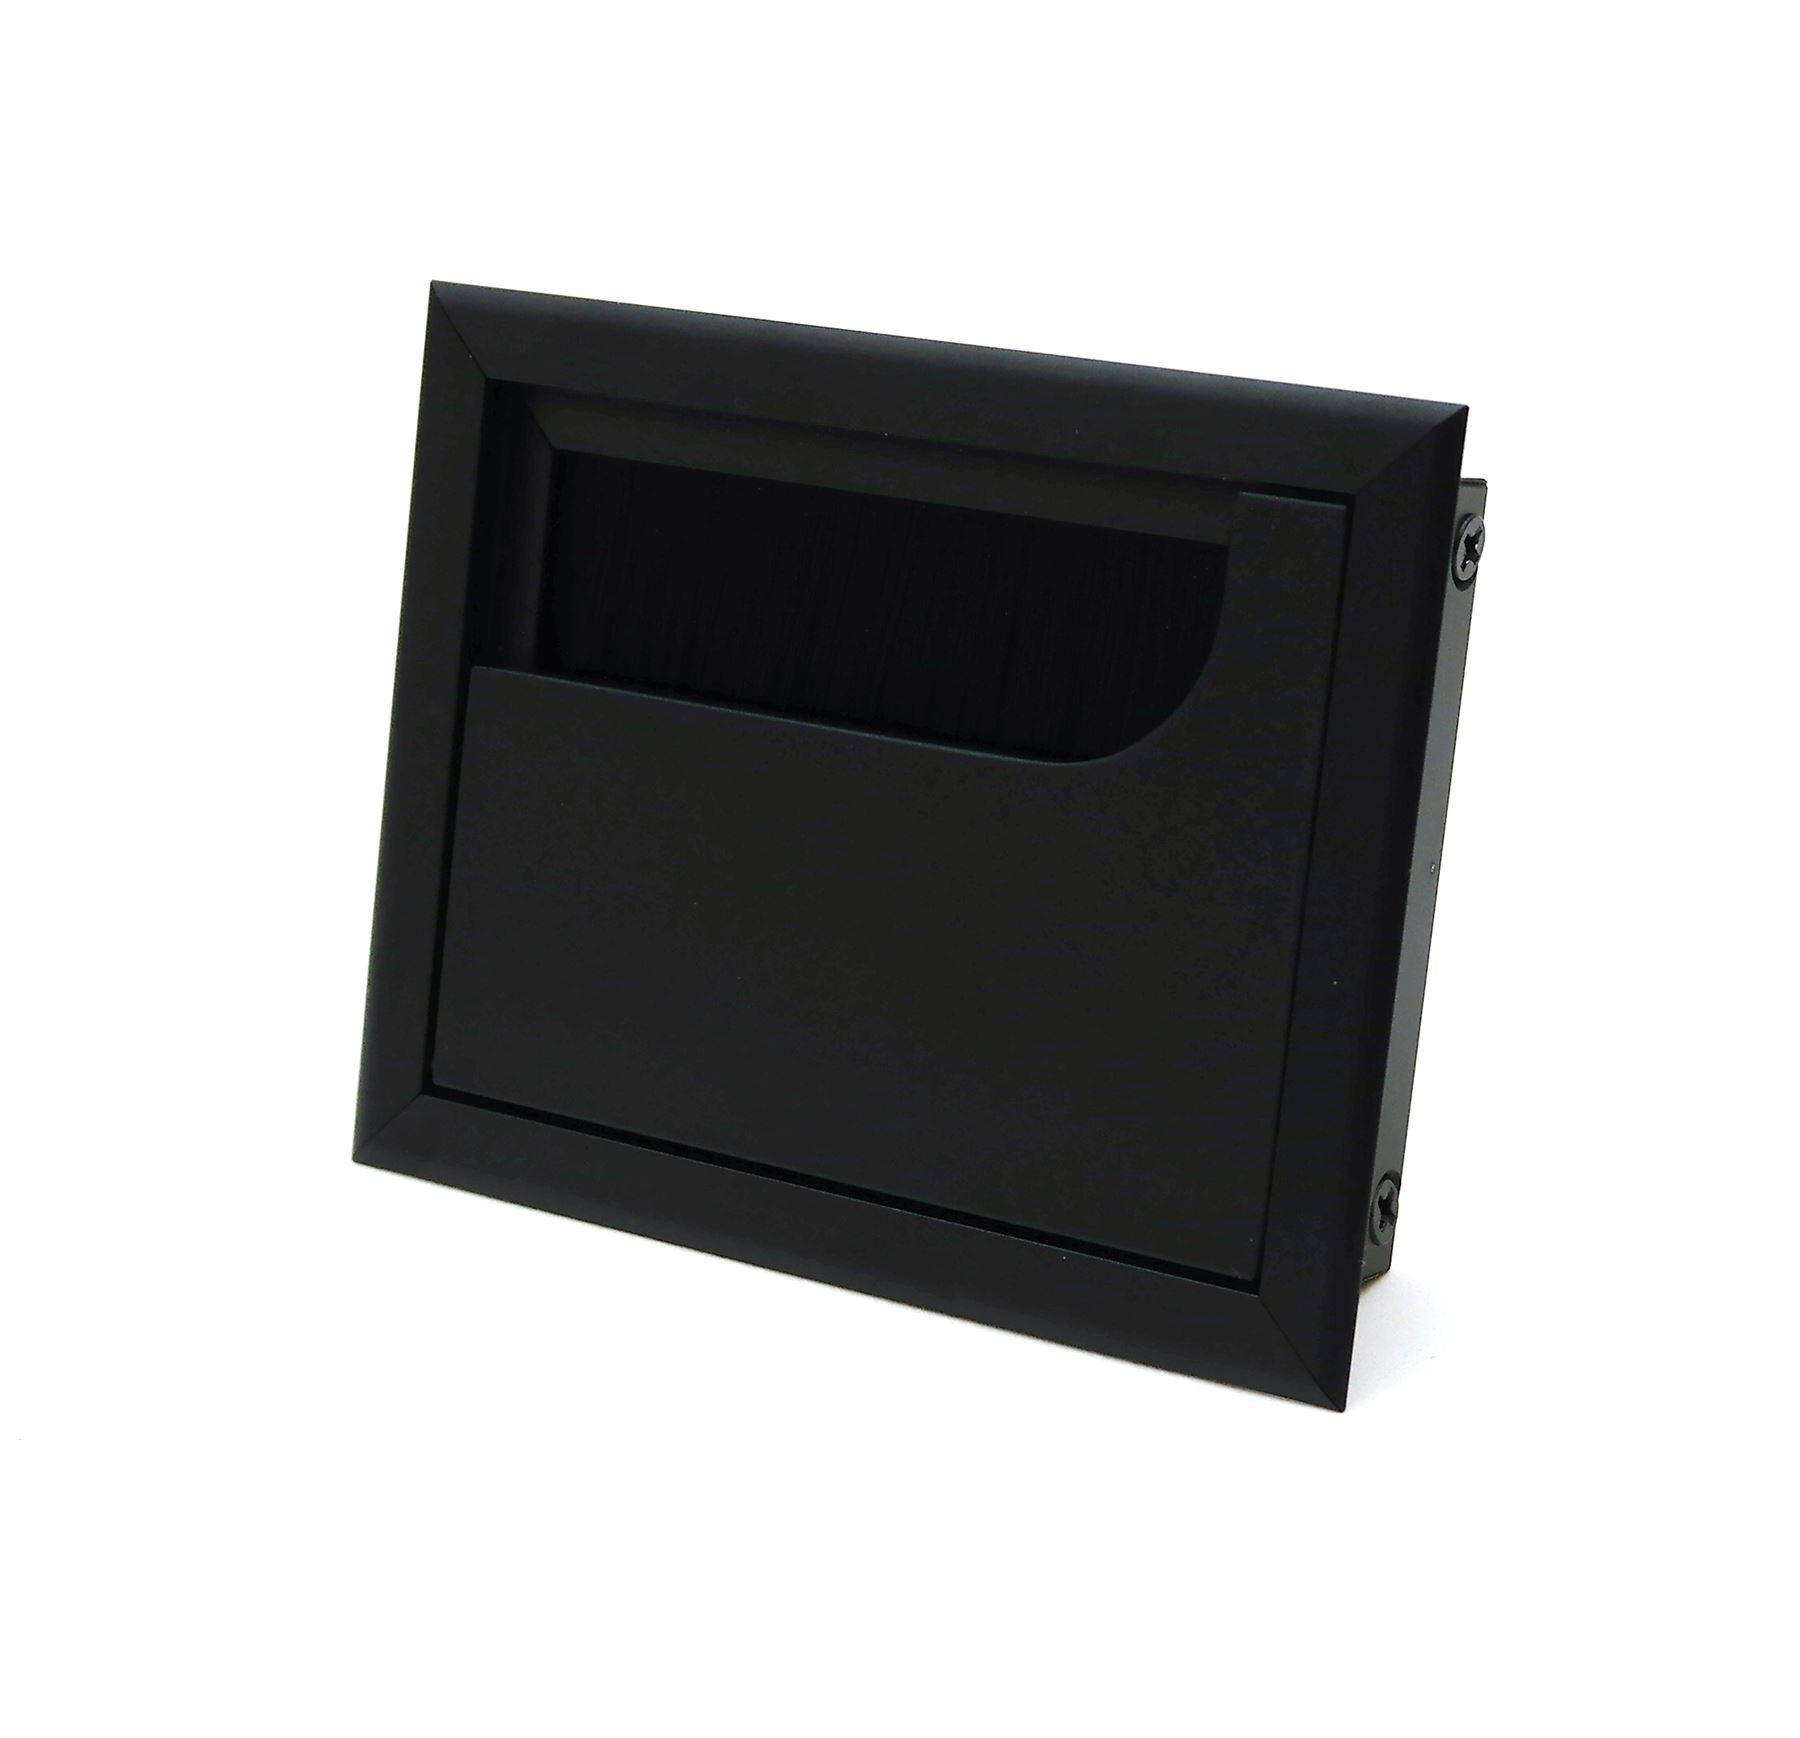 passe cable grommet passe fil metal design diam tre 60mm ou 80mm ou usb ebay. Black Bedroom Furniture Sets. Home Design Ideas